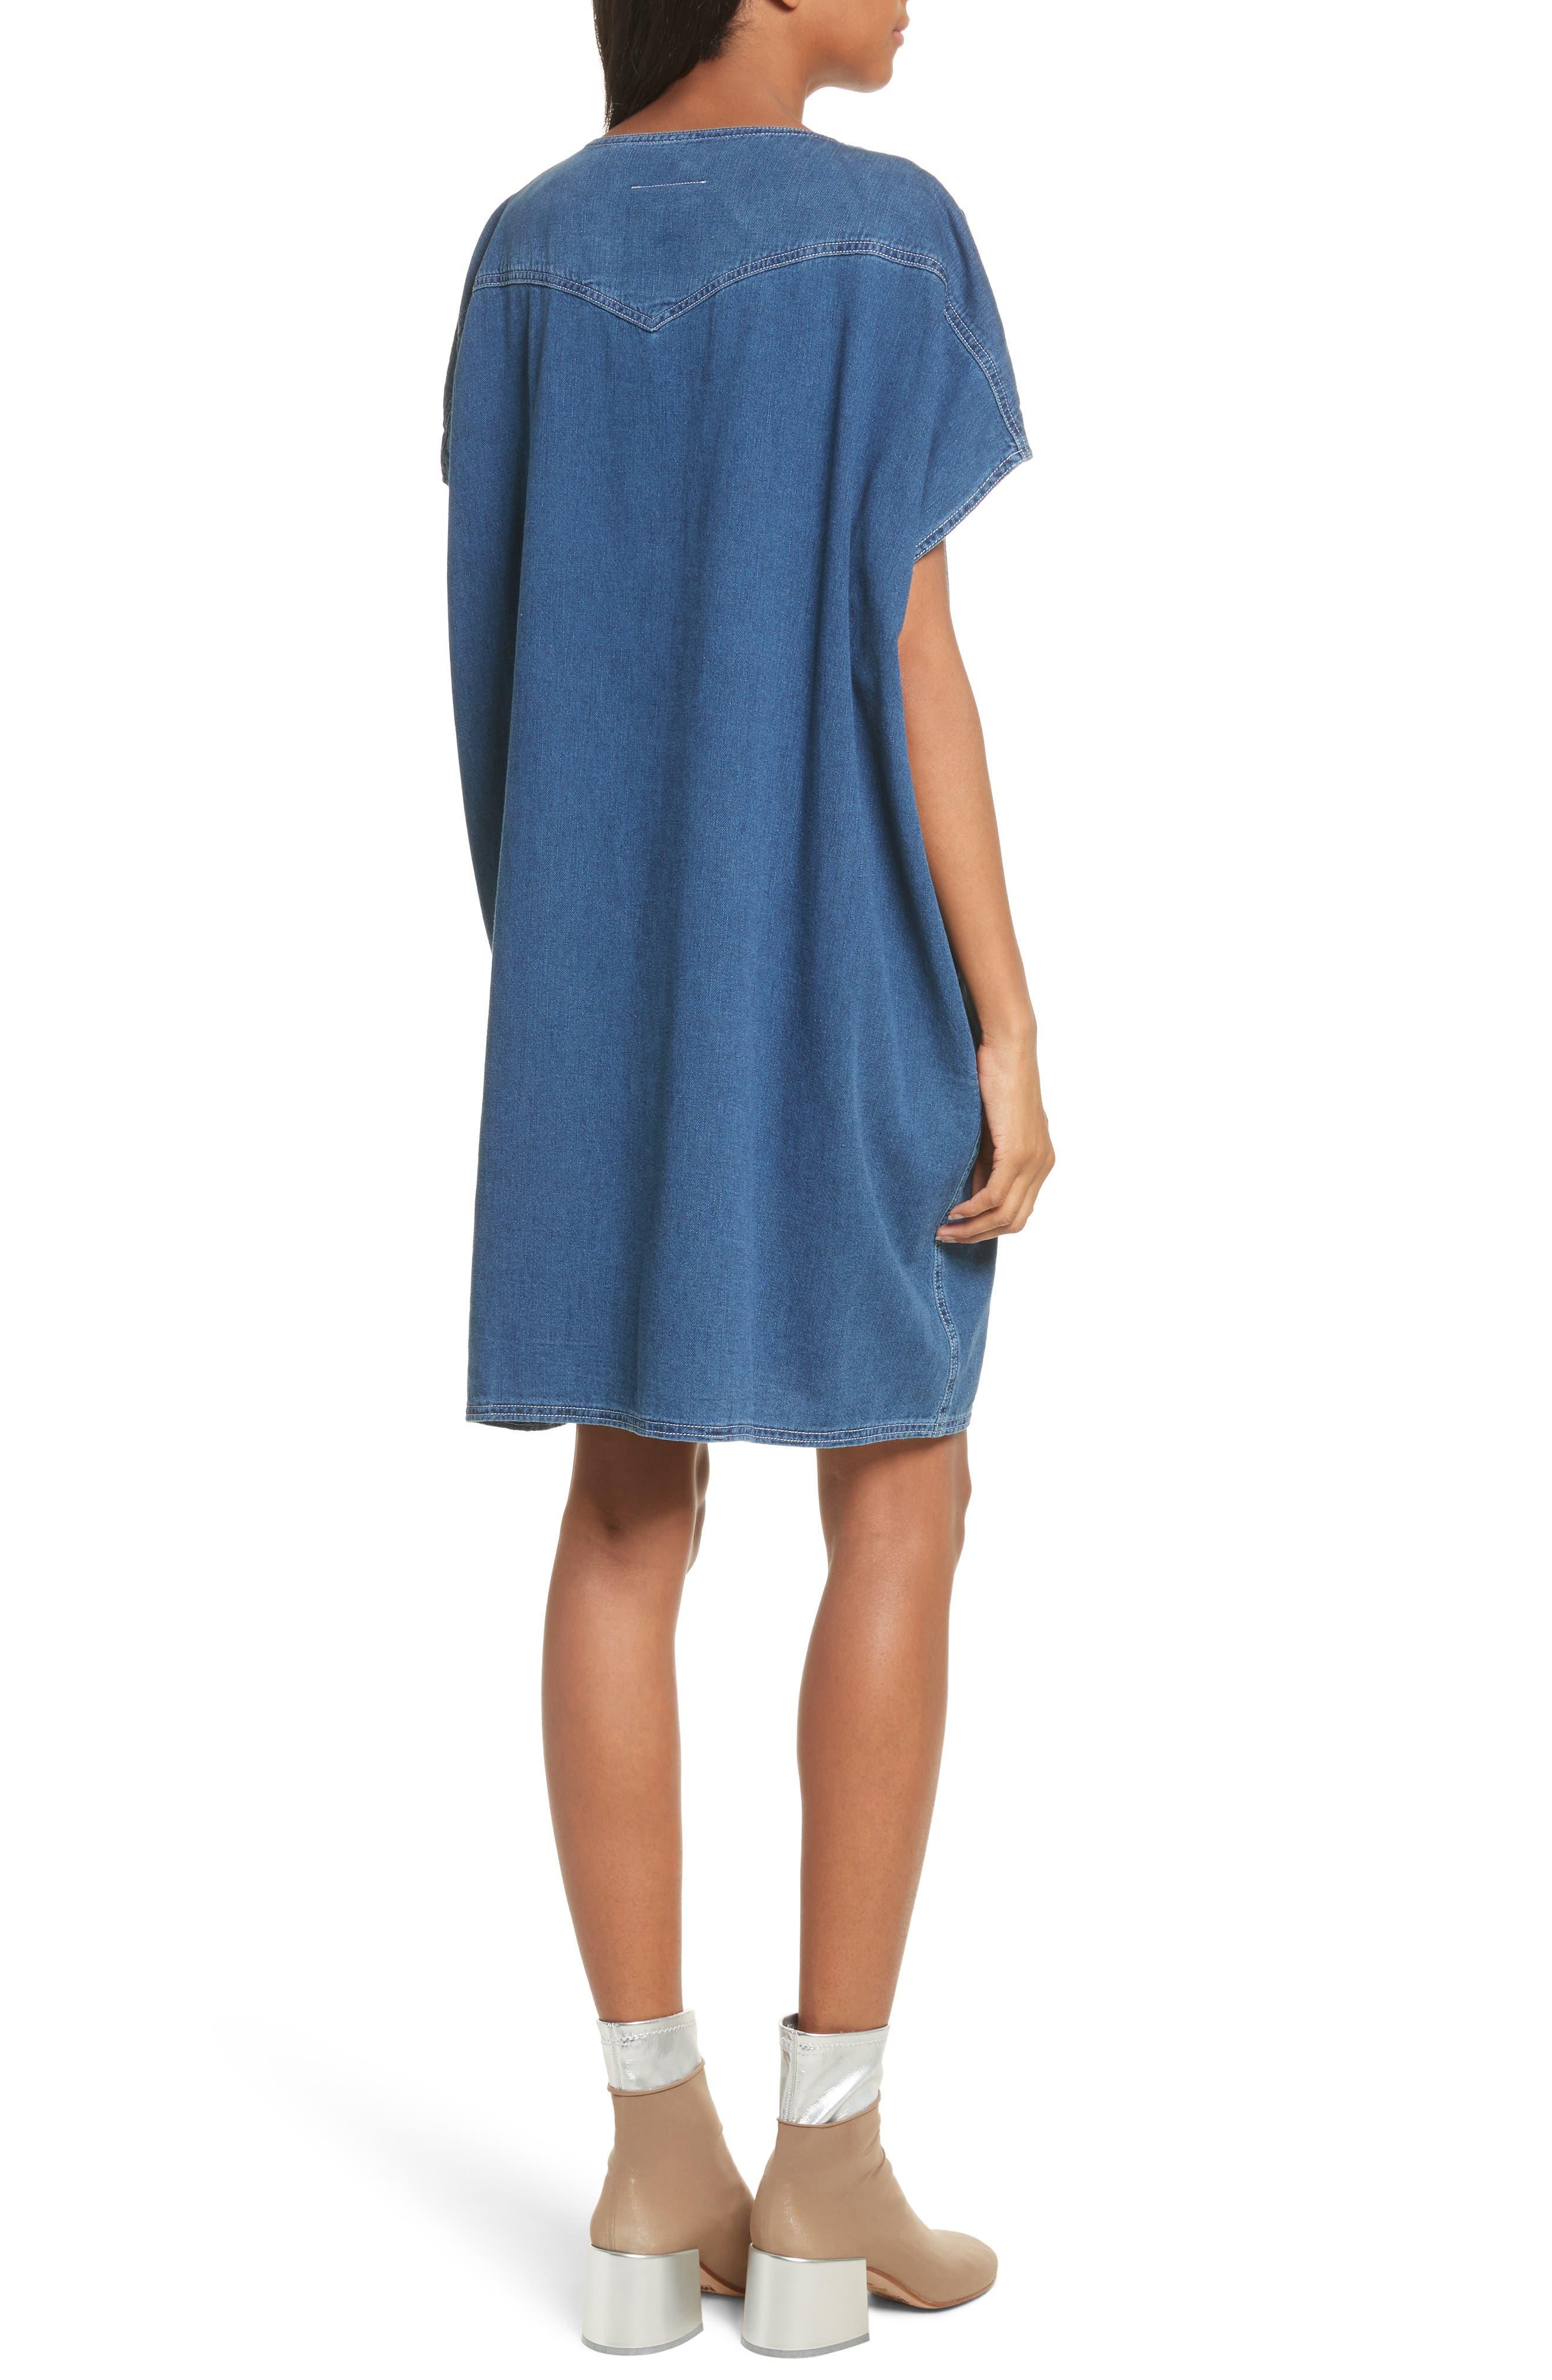 '80s Wash Denim Dress,                             Alternate thumbnail 2, color,                             Medium Blue